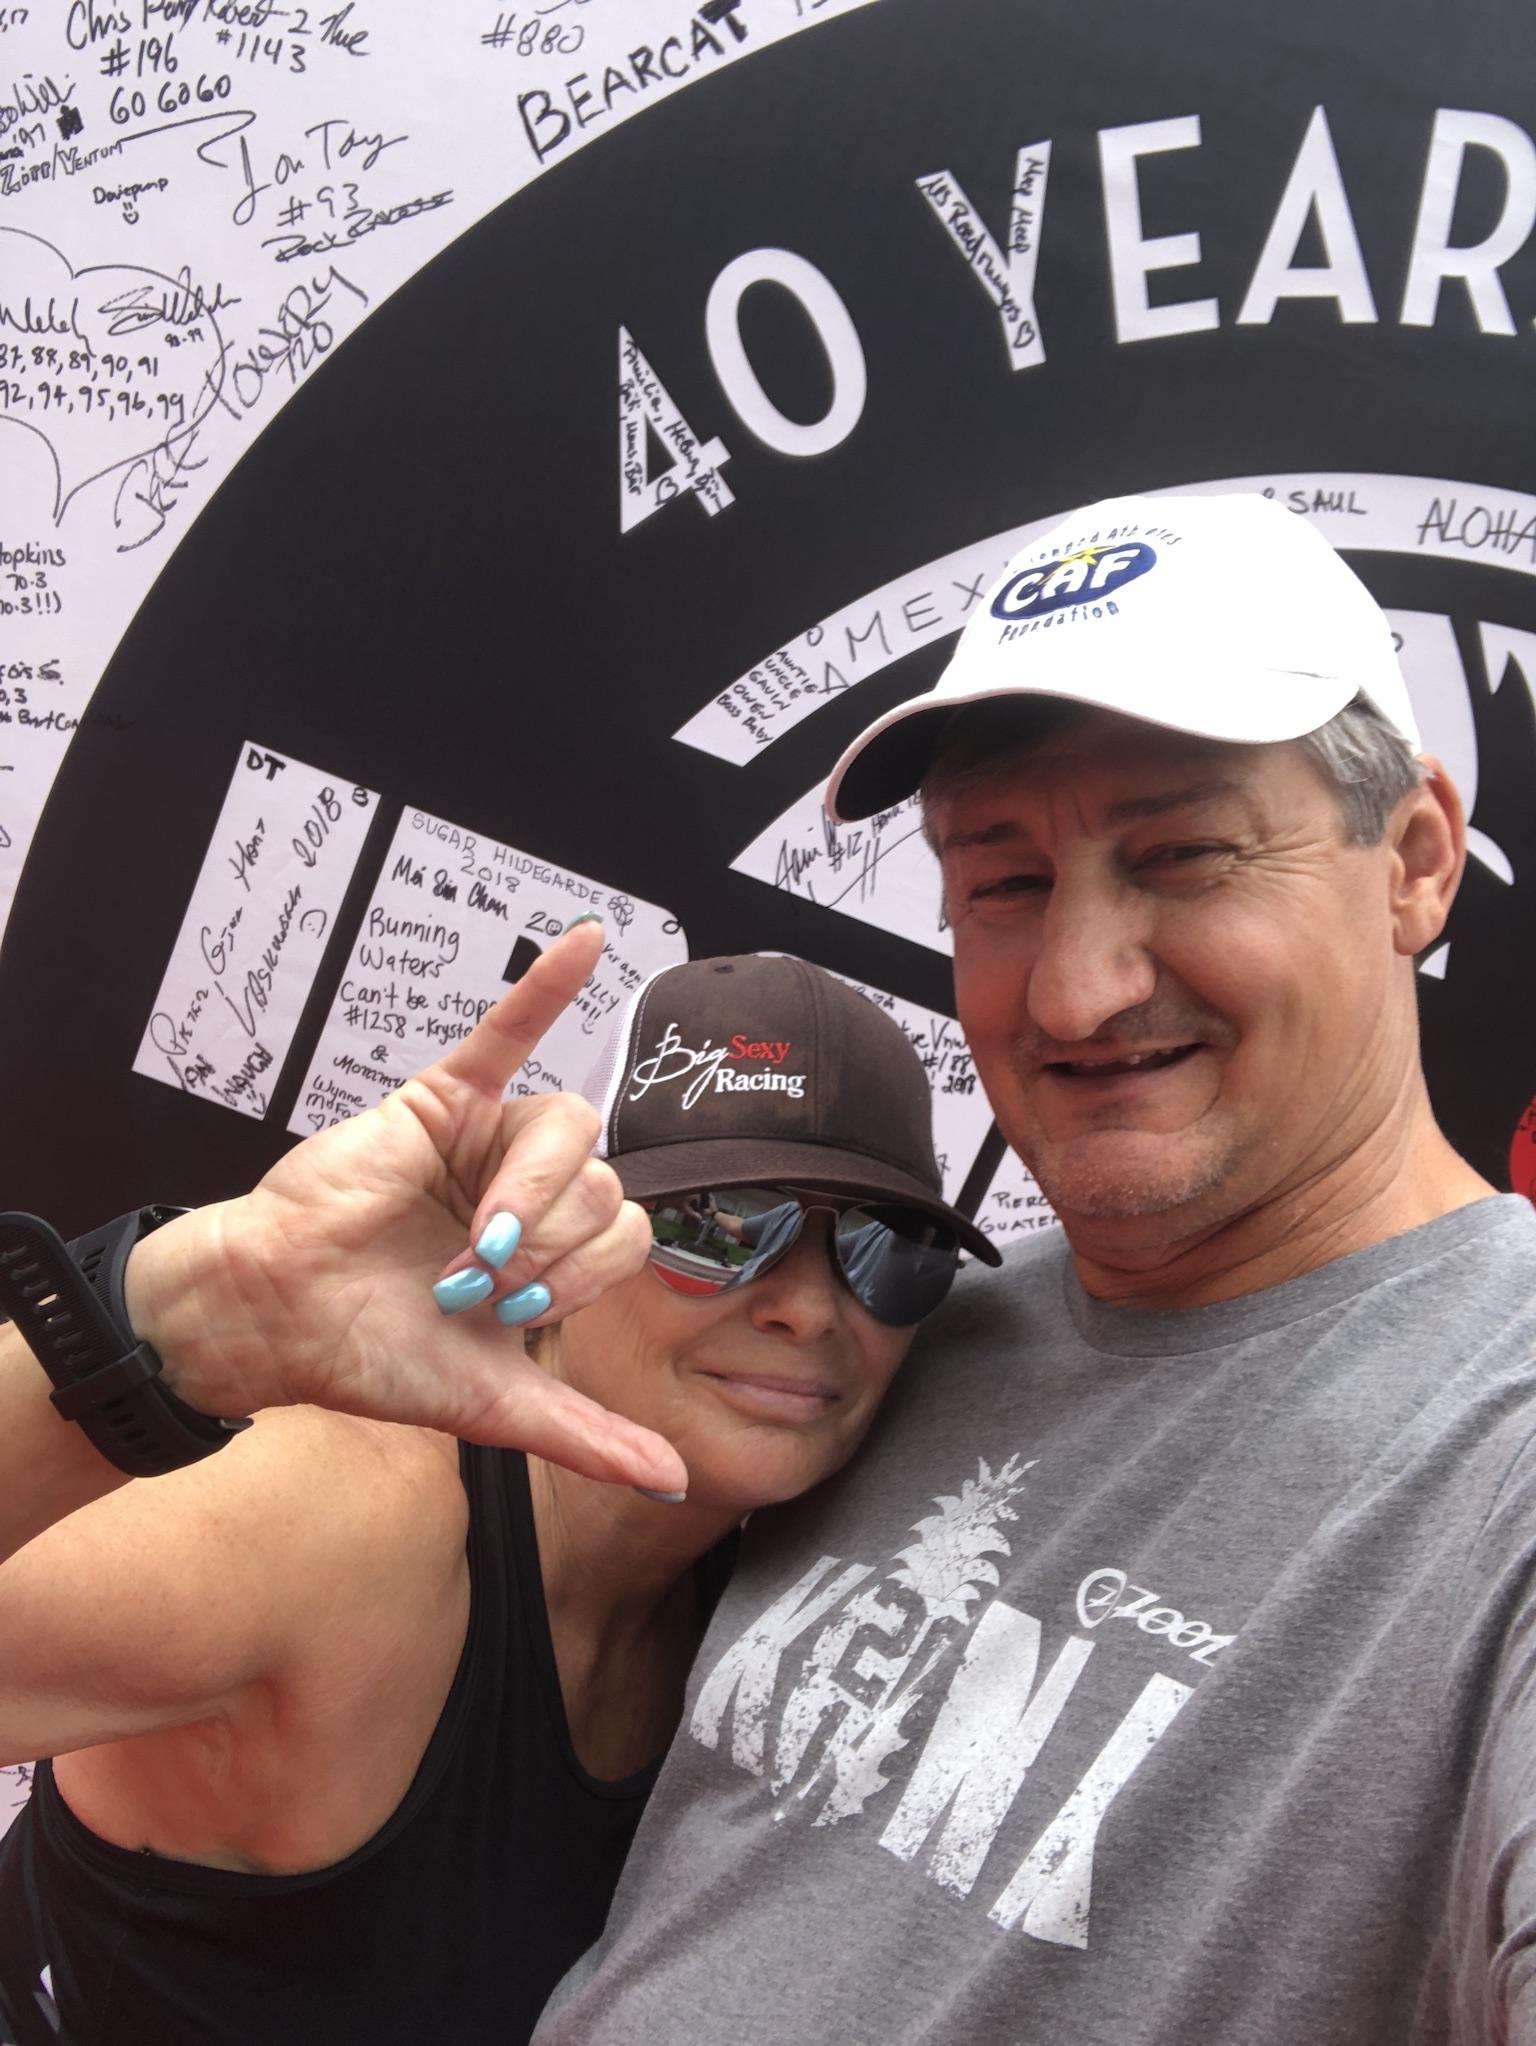 Coach_Terry_Wilson_Elaine_Gower_Ironman_Hawaii_70.3_Together.jpeg